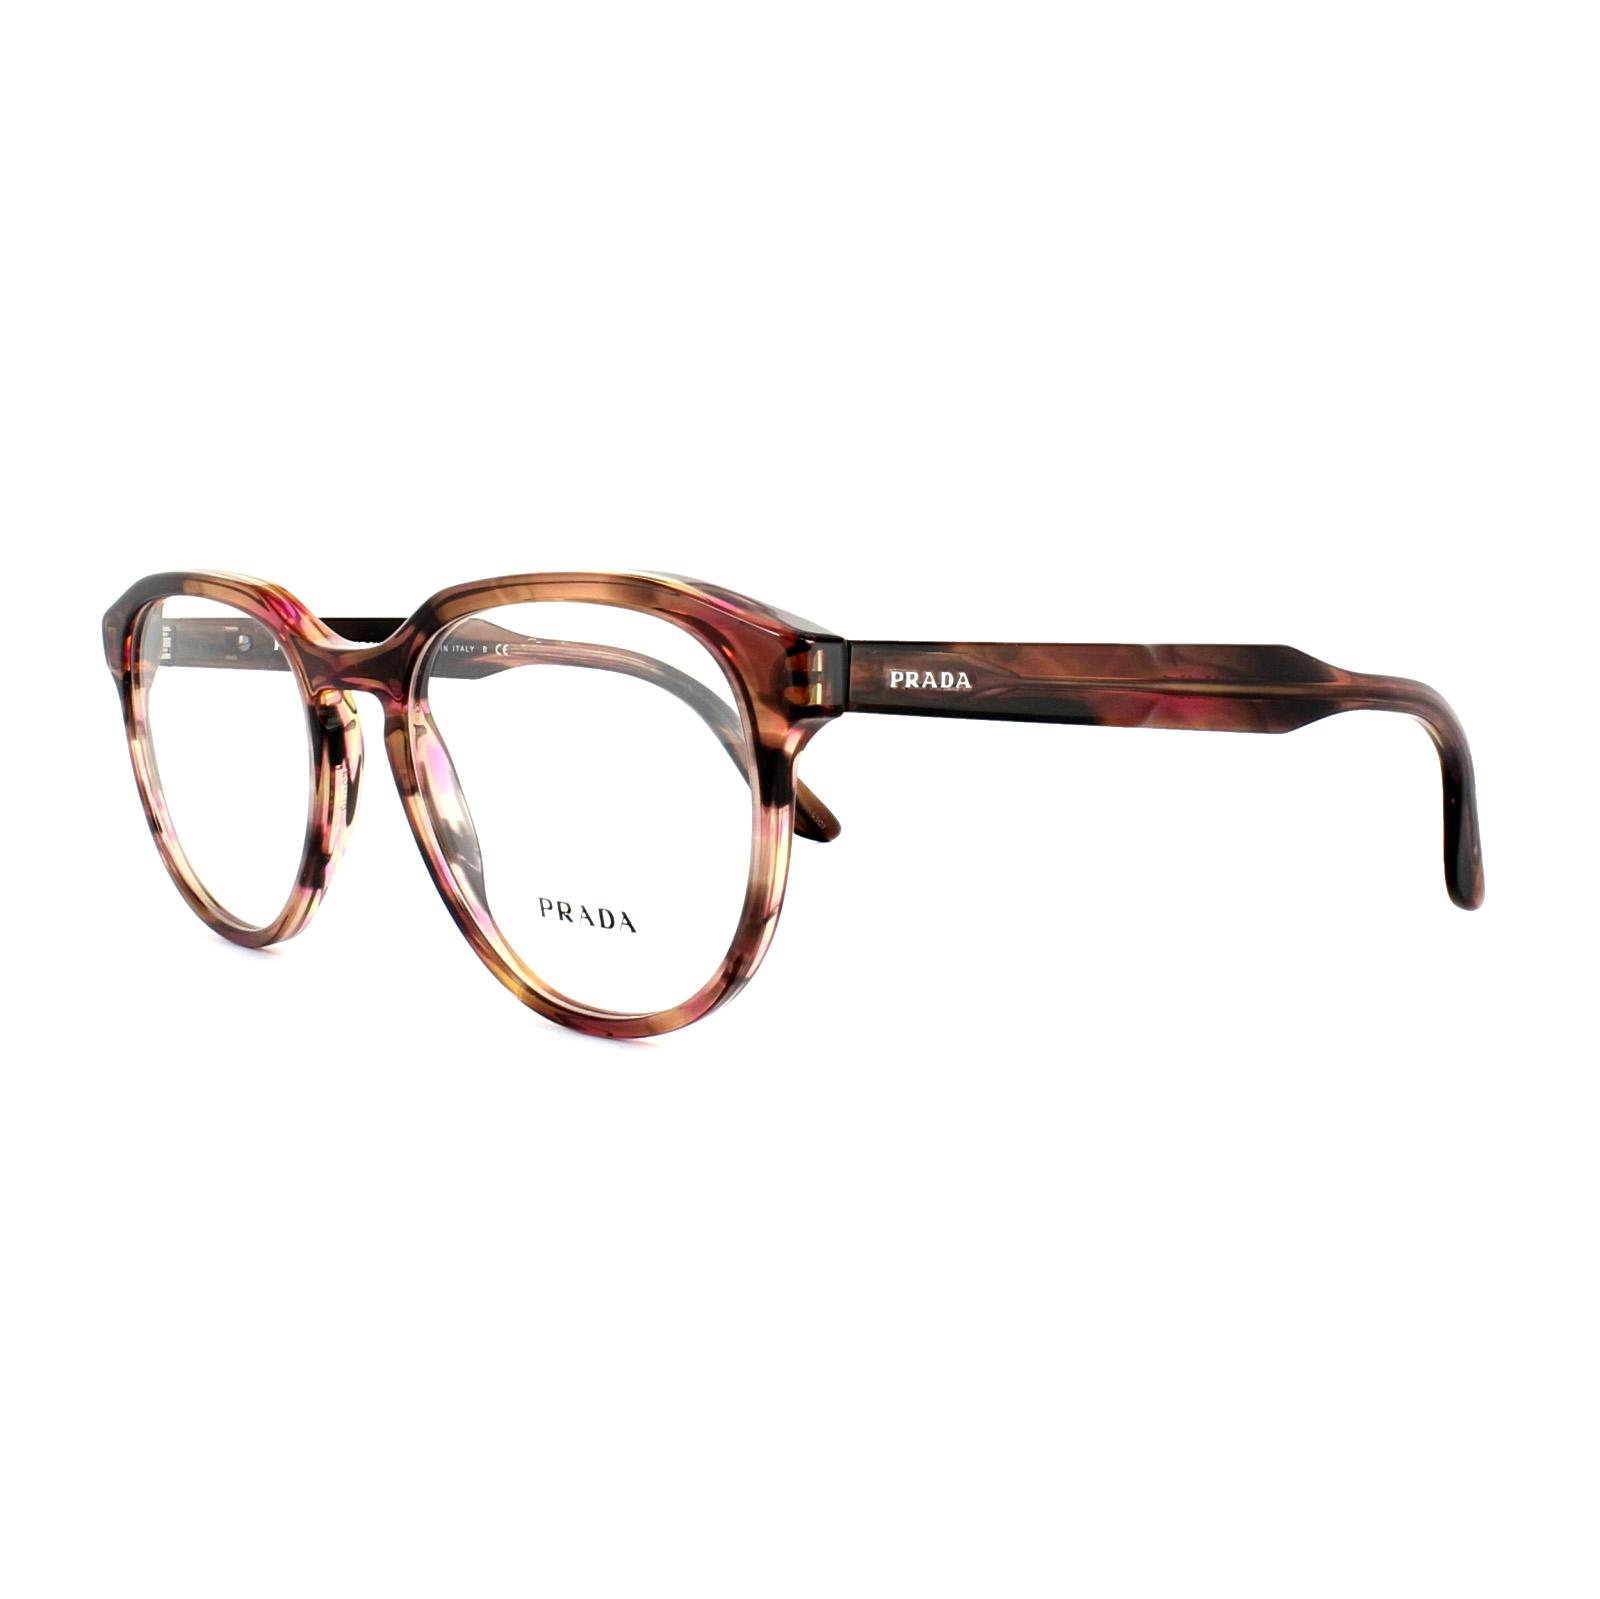 d81d649121a0 Sentinel Prada Glasses Frames PR 18SV UEO1O1 Striped Brown Mens 53mm